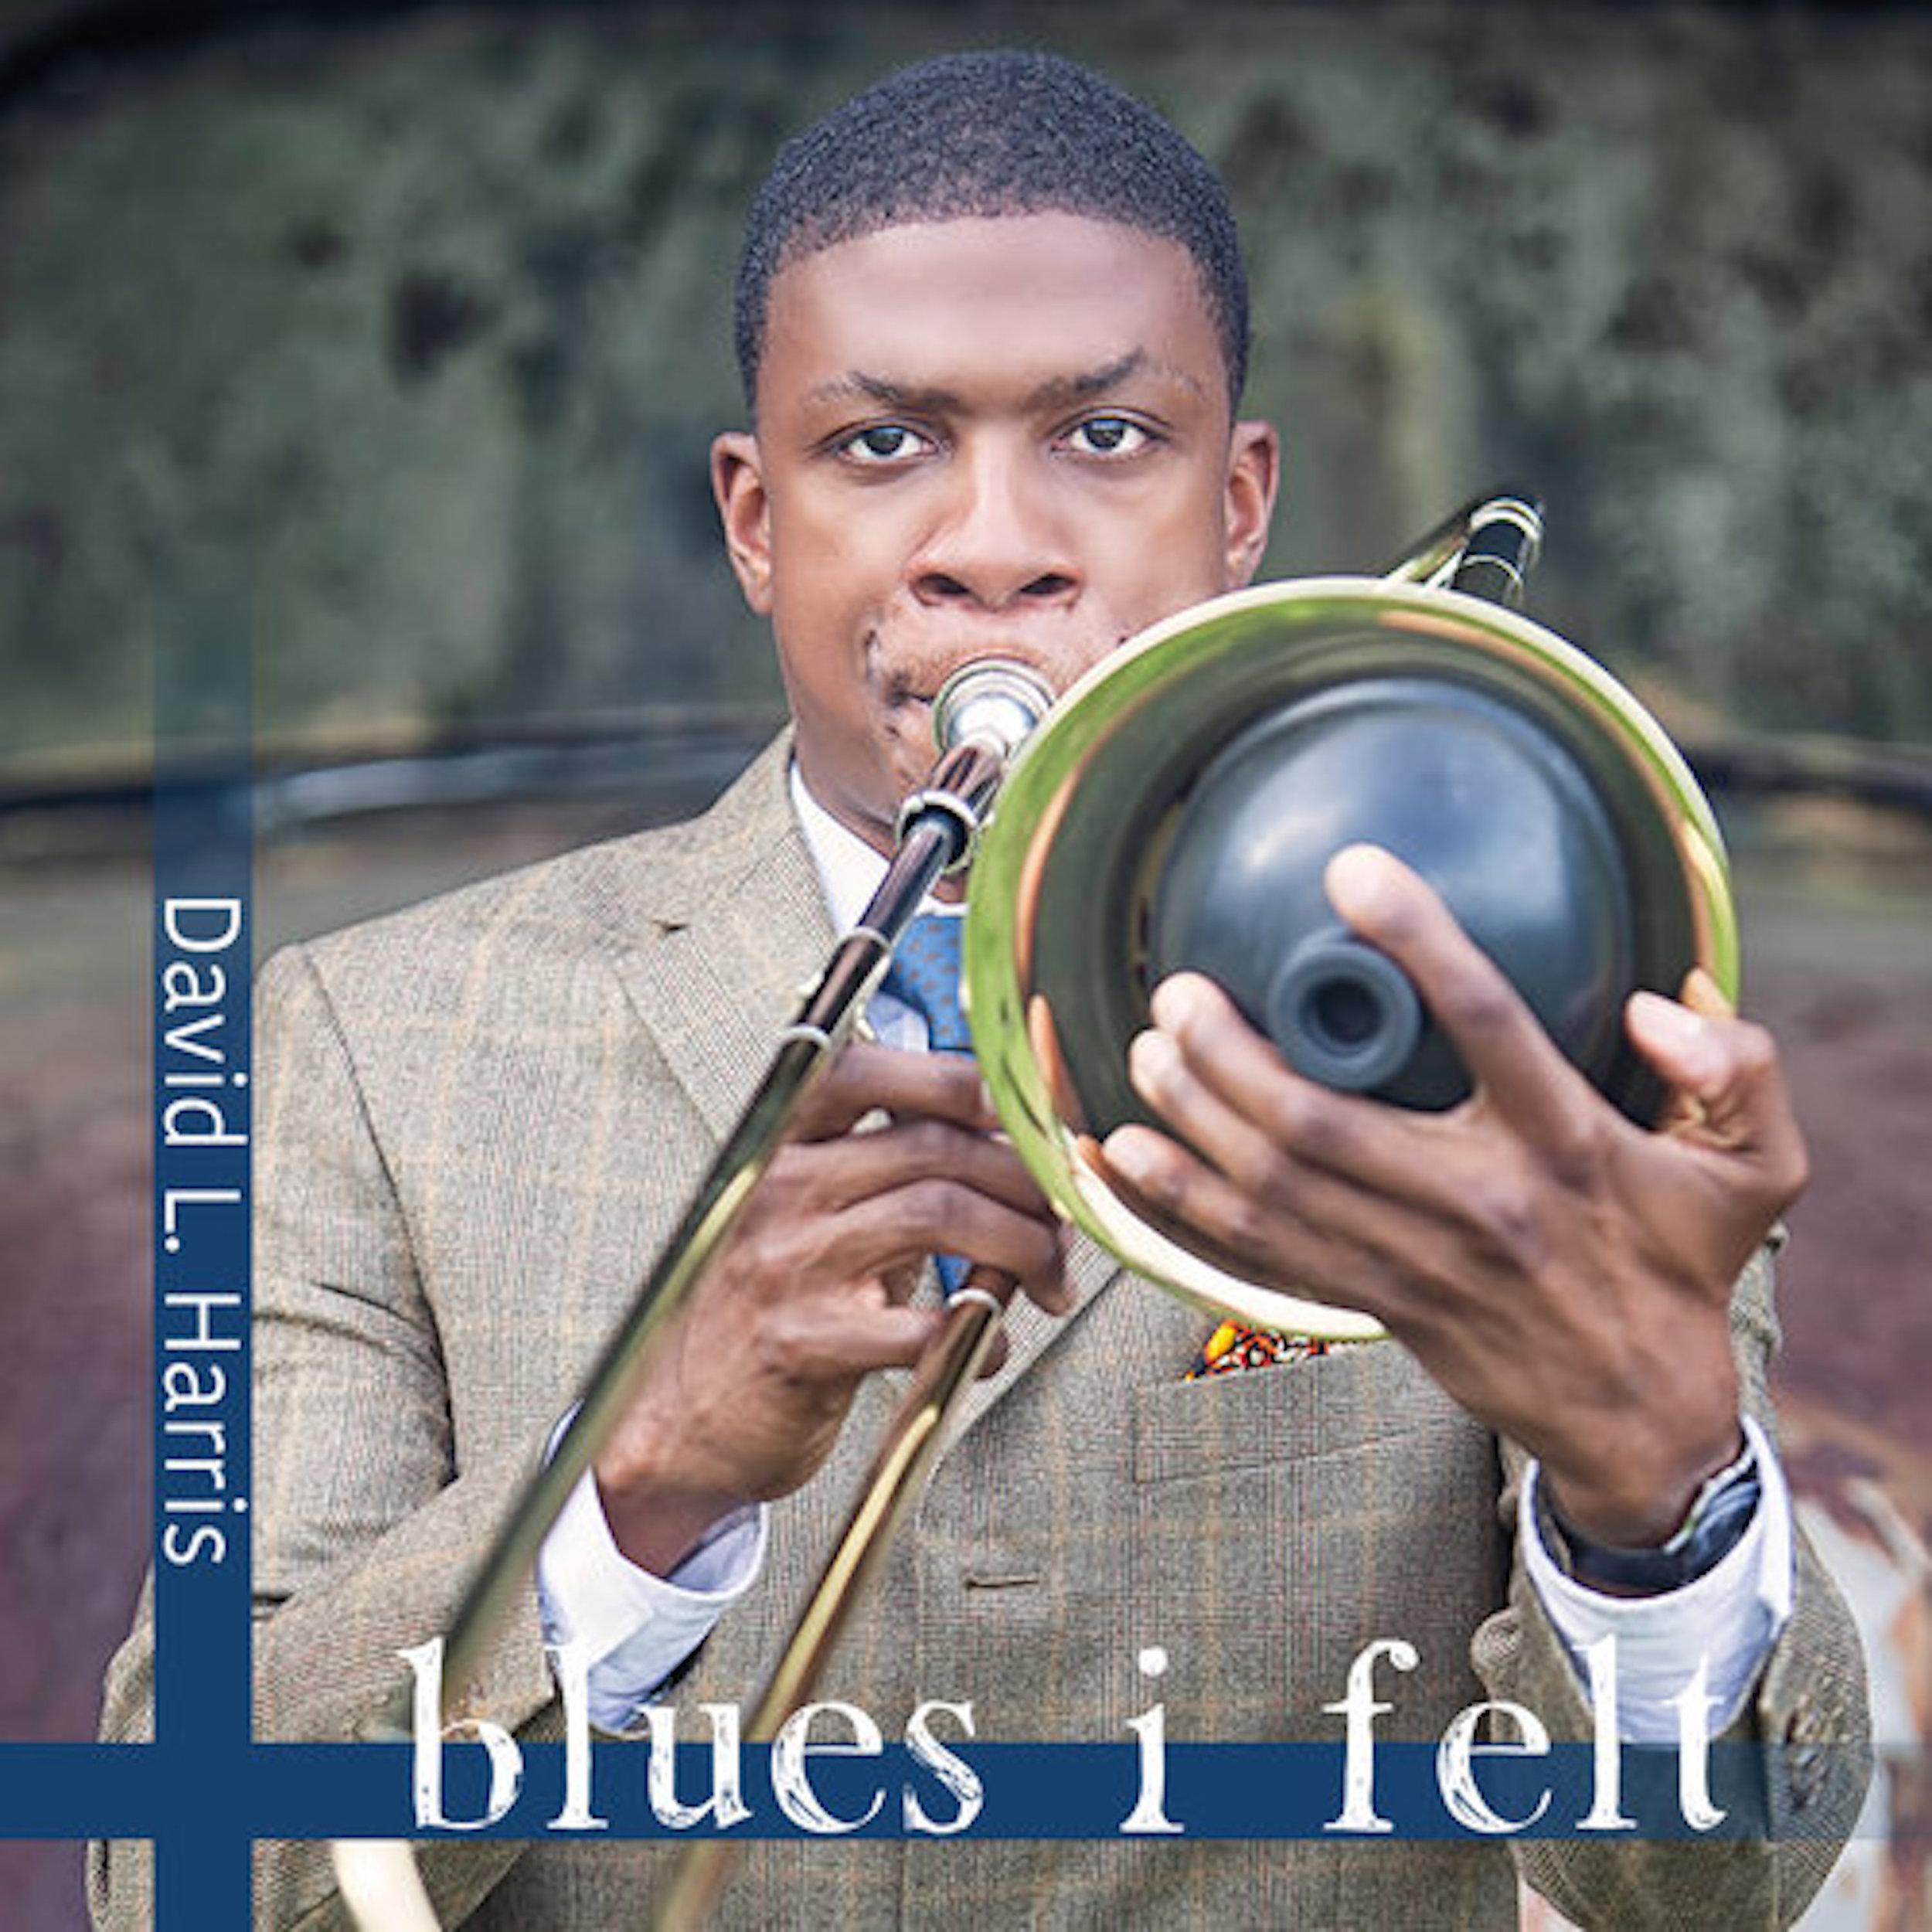 Blues+I+Felt+Cover.jpg